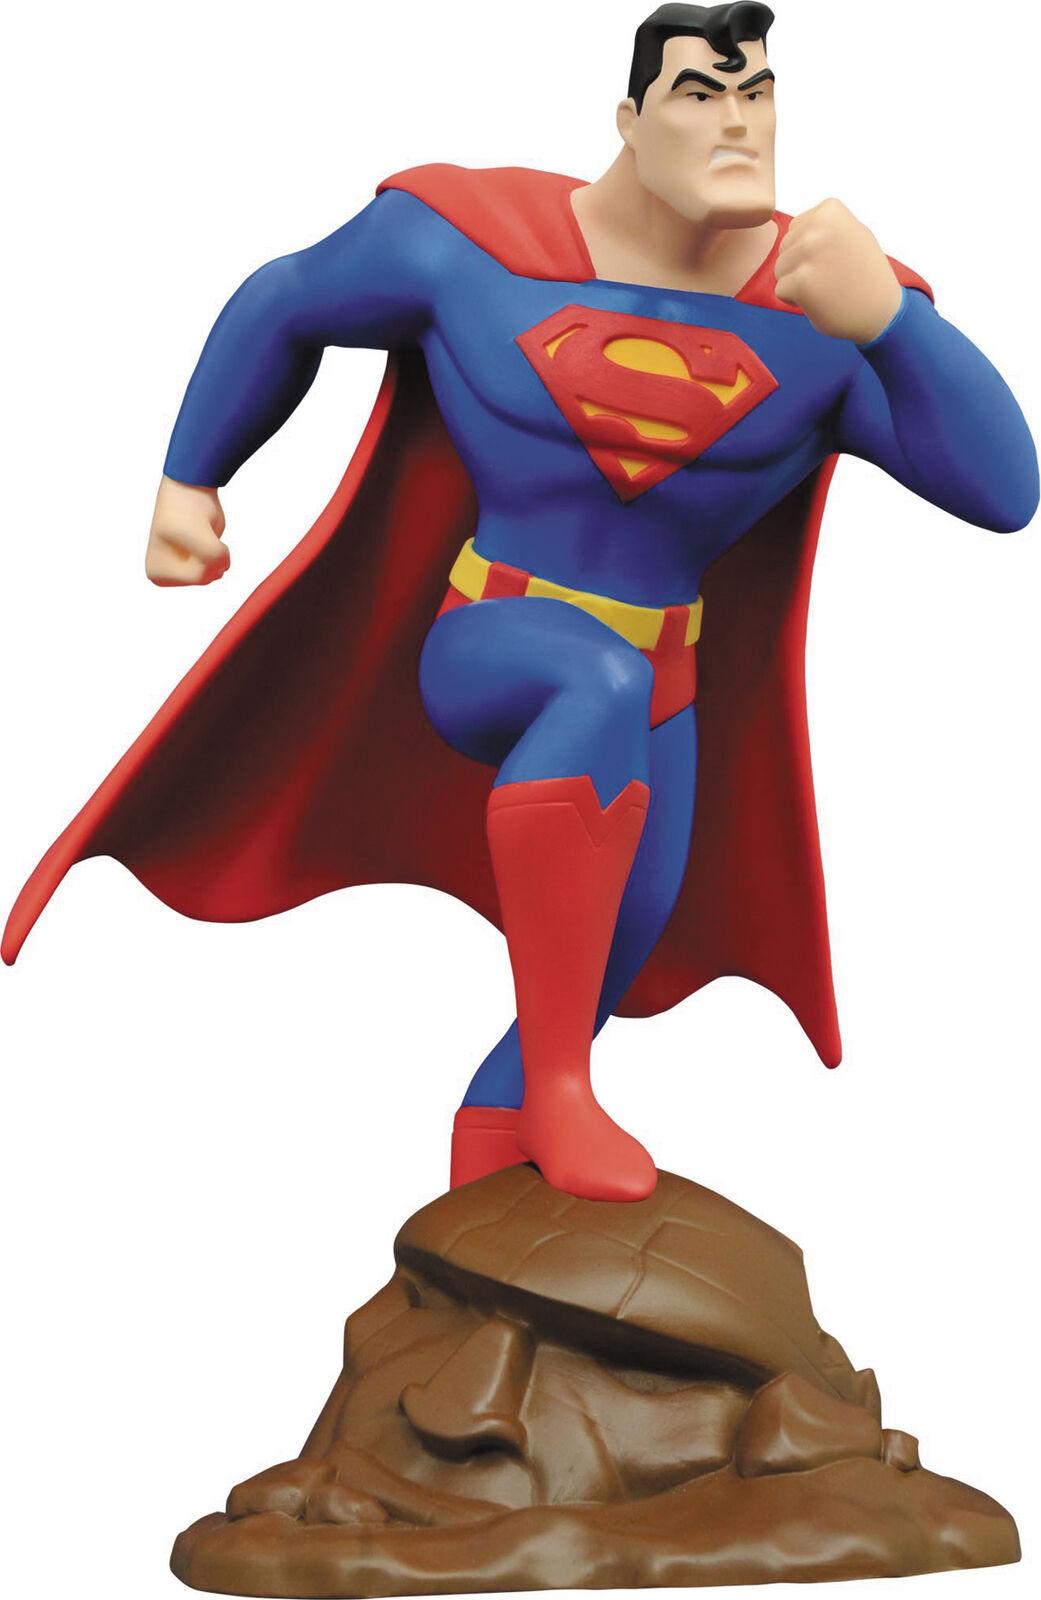 Dc diamond galerie superman tas pvc figure neue boxen